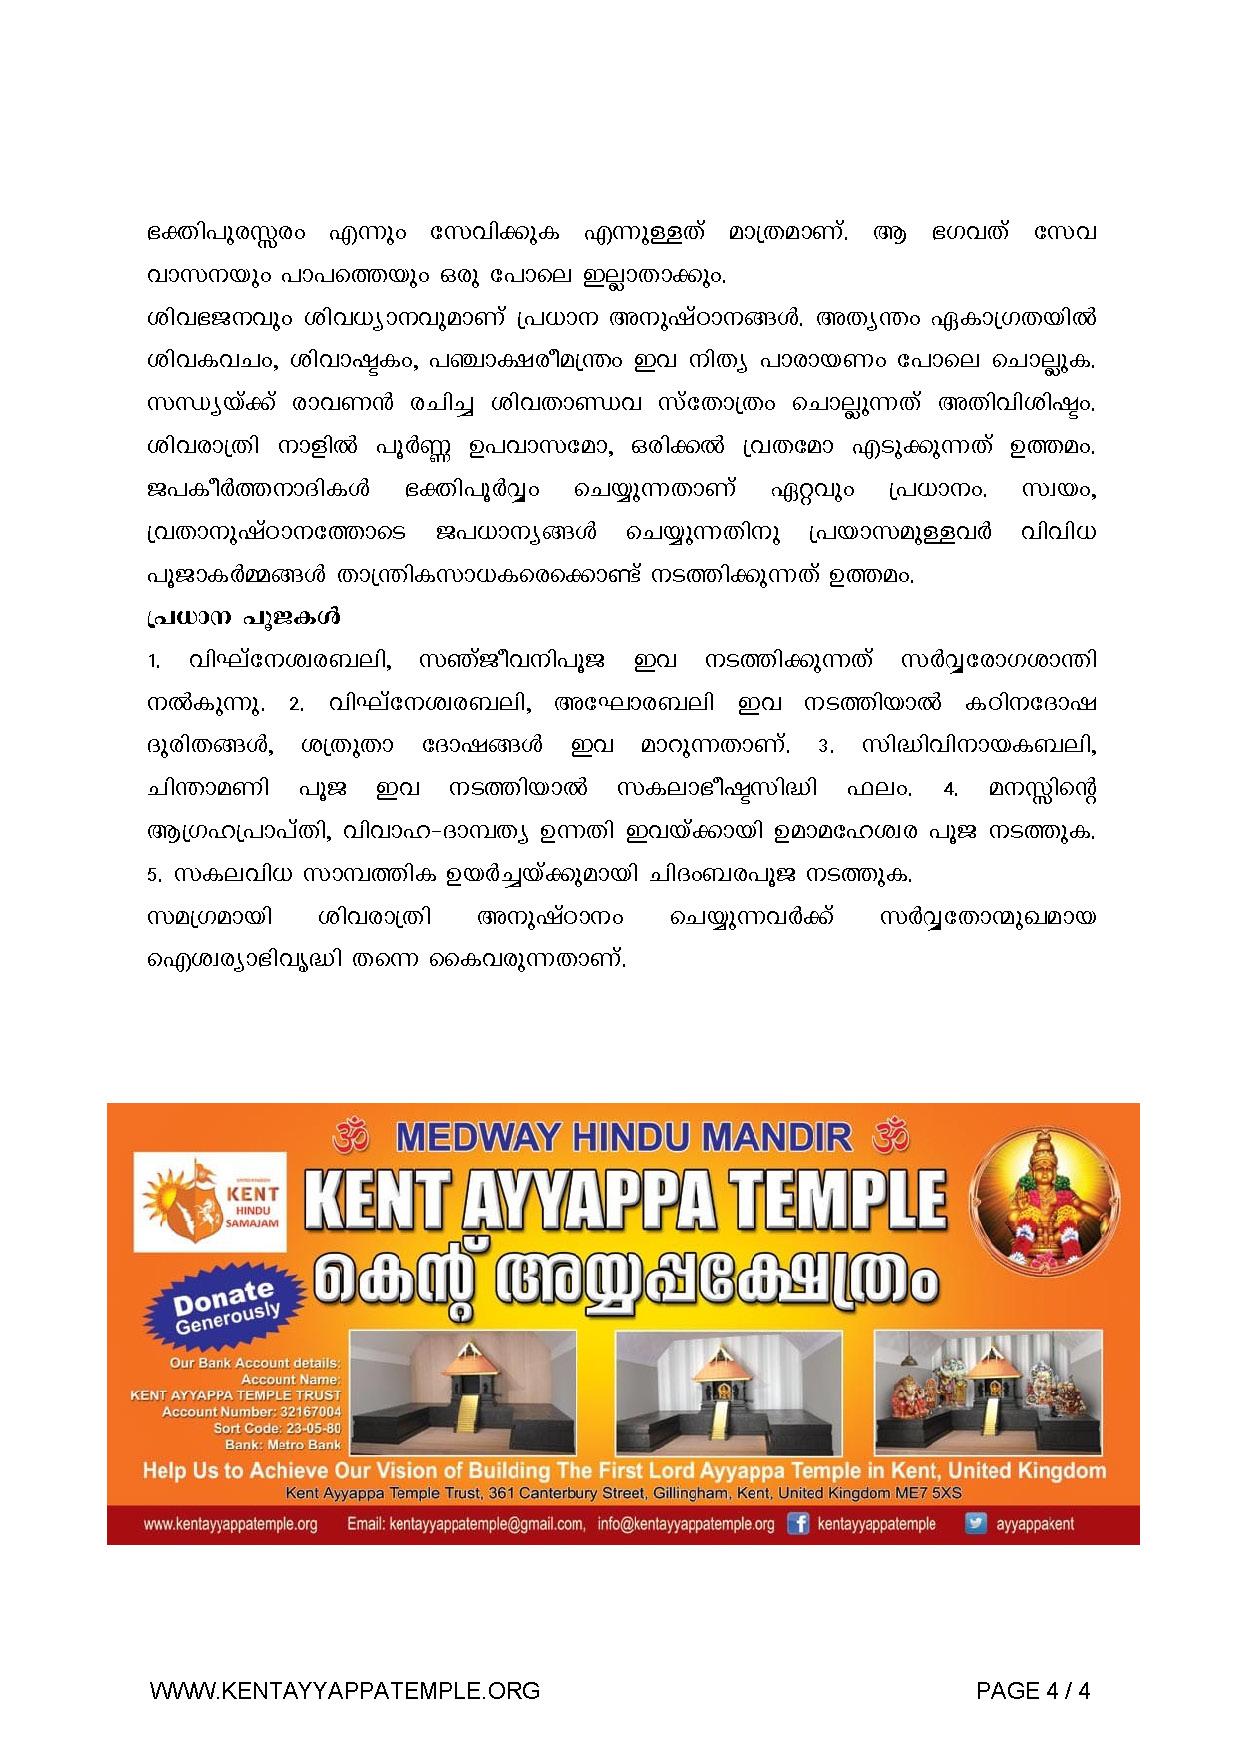 Shivaratri Celebrations by Kent Ayyappa Temple